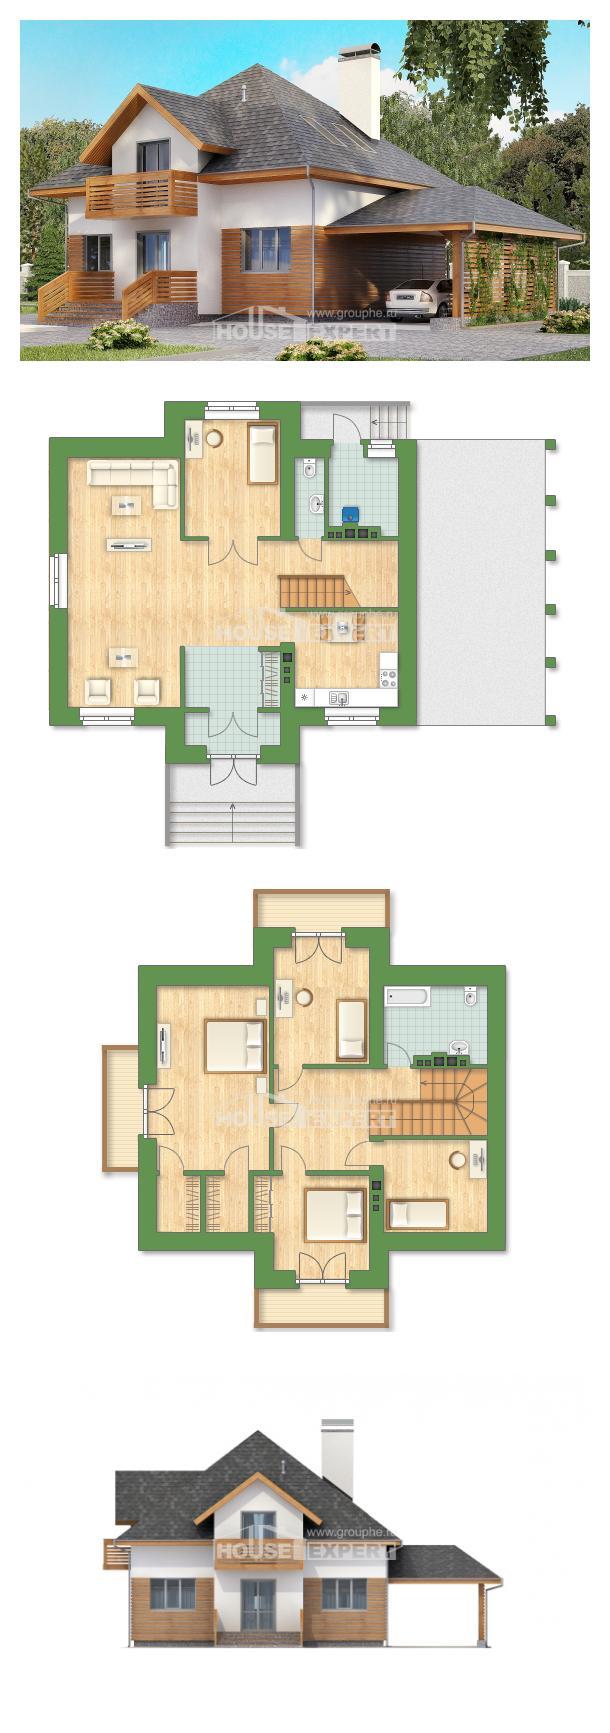 Ev villa projesi 155-004-R | House Expert